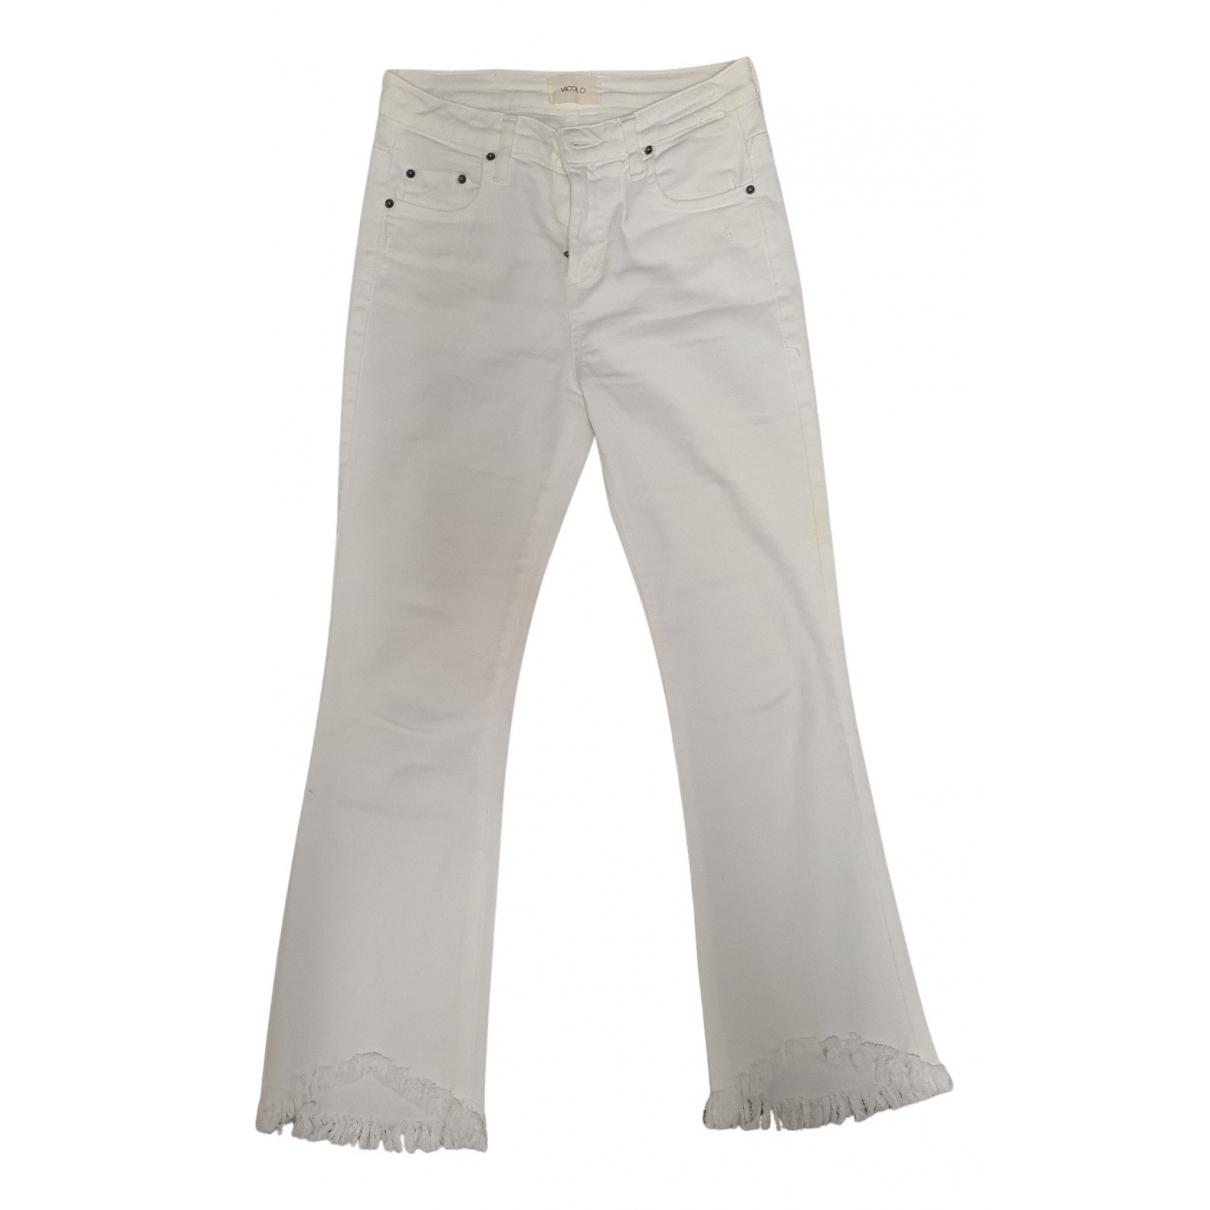 Vicolo N White Denim - Jeans Trousers for Women S International